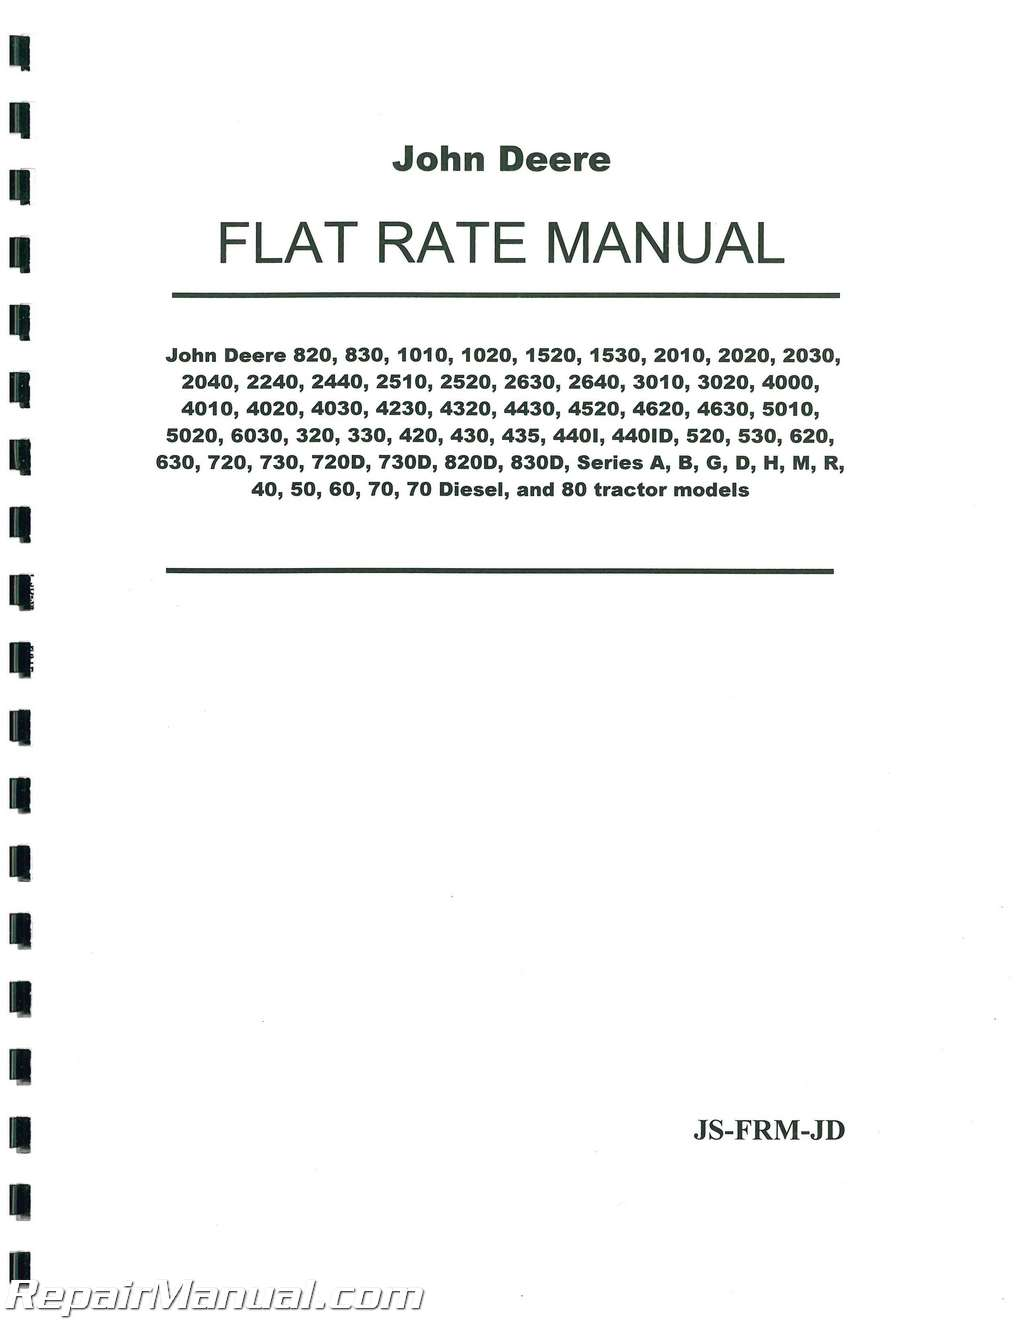 john deere tractor flat rate manual rh repairmanual com USPS Flat Rate USPS Flat Rate